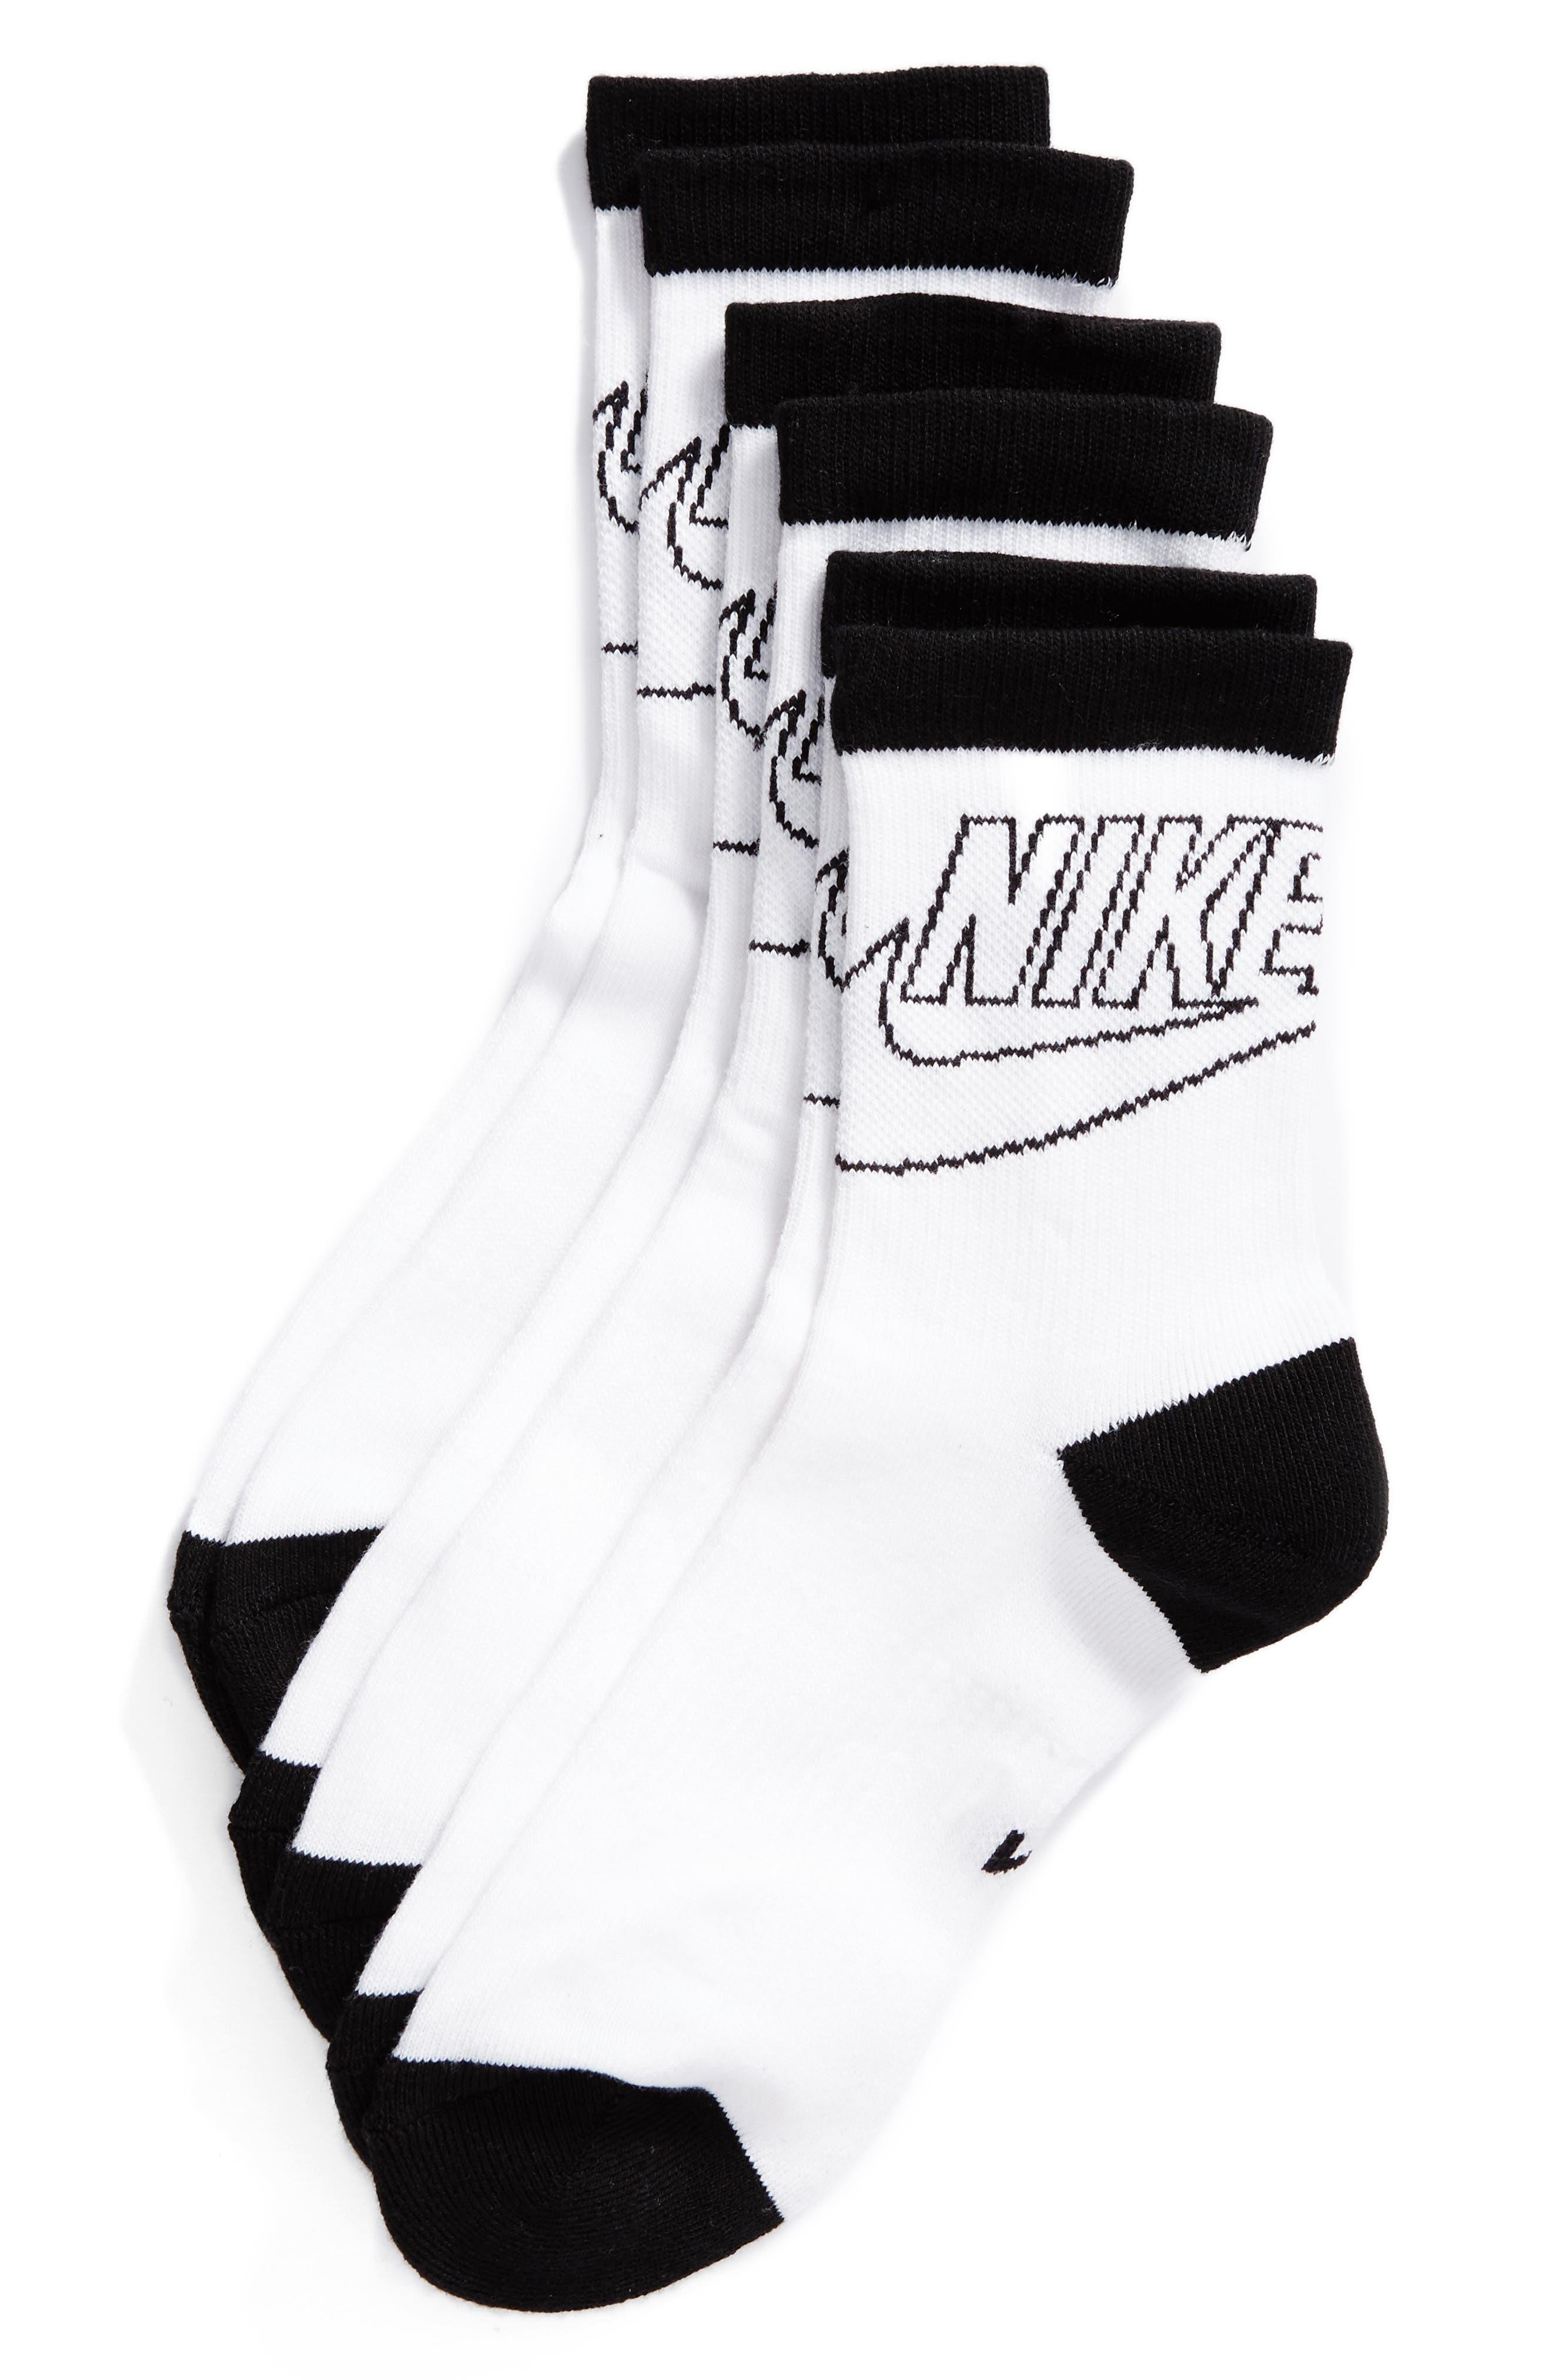 Nike 3-Pack Crew Socks